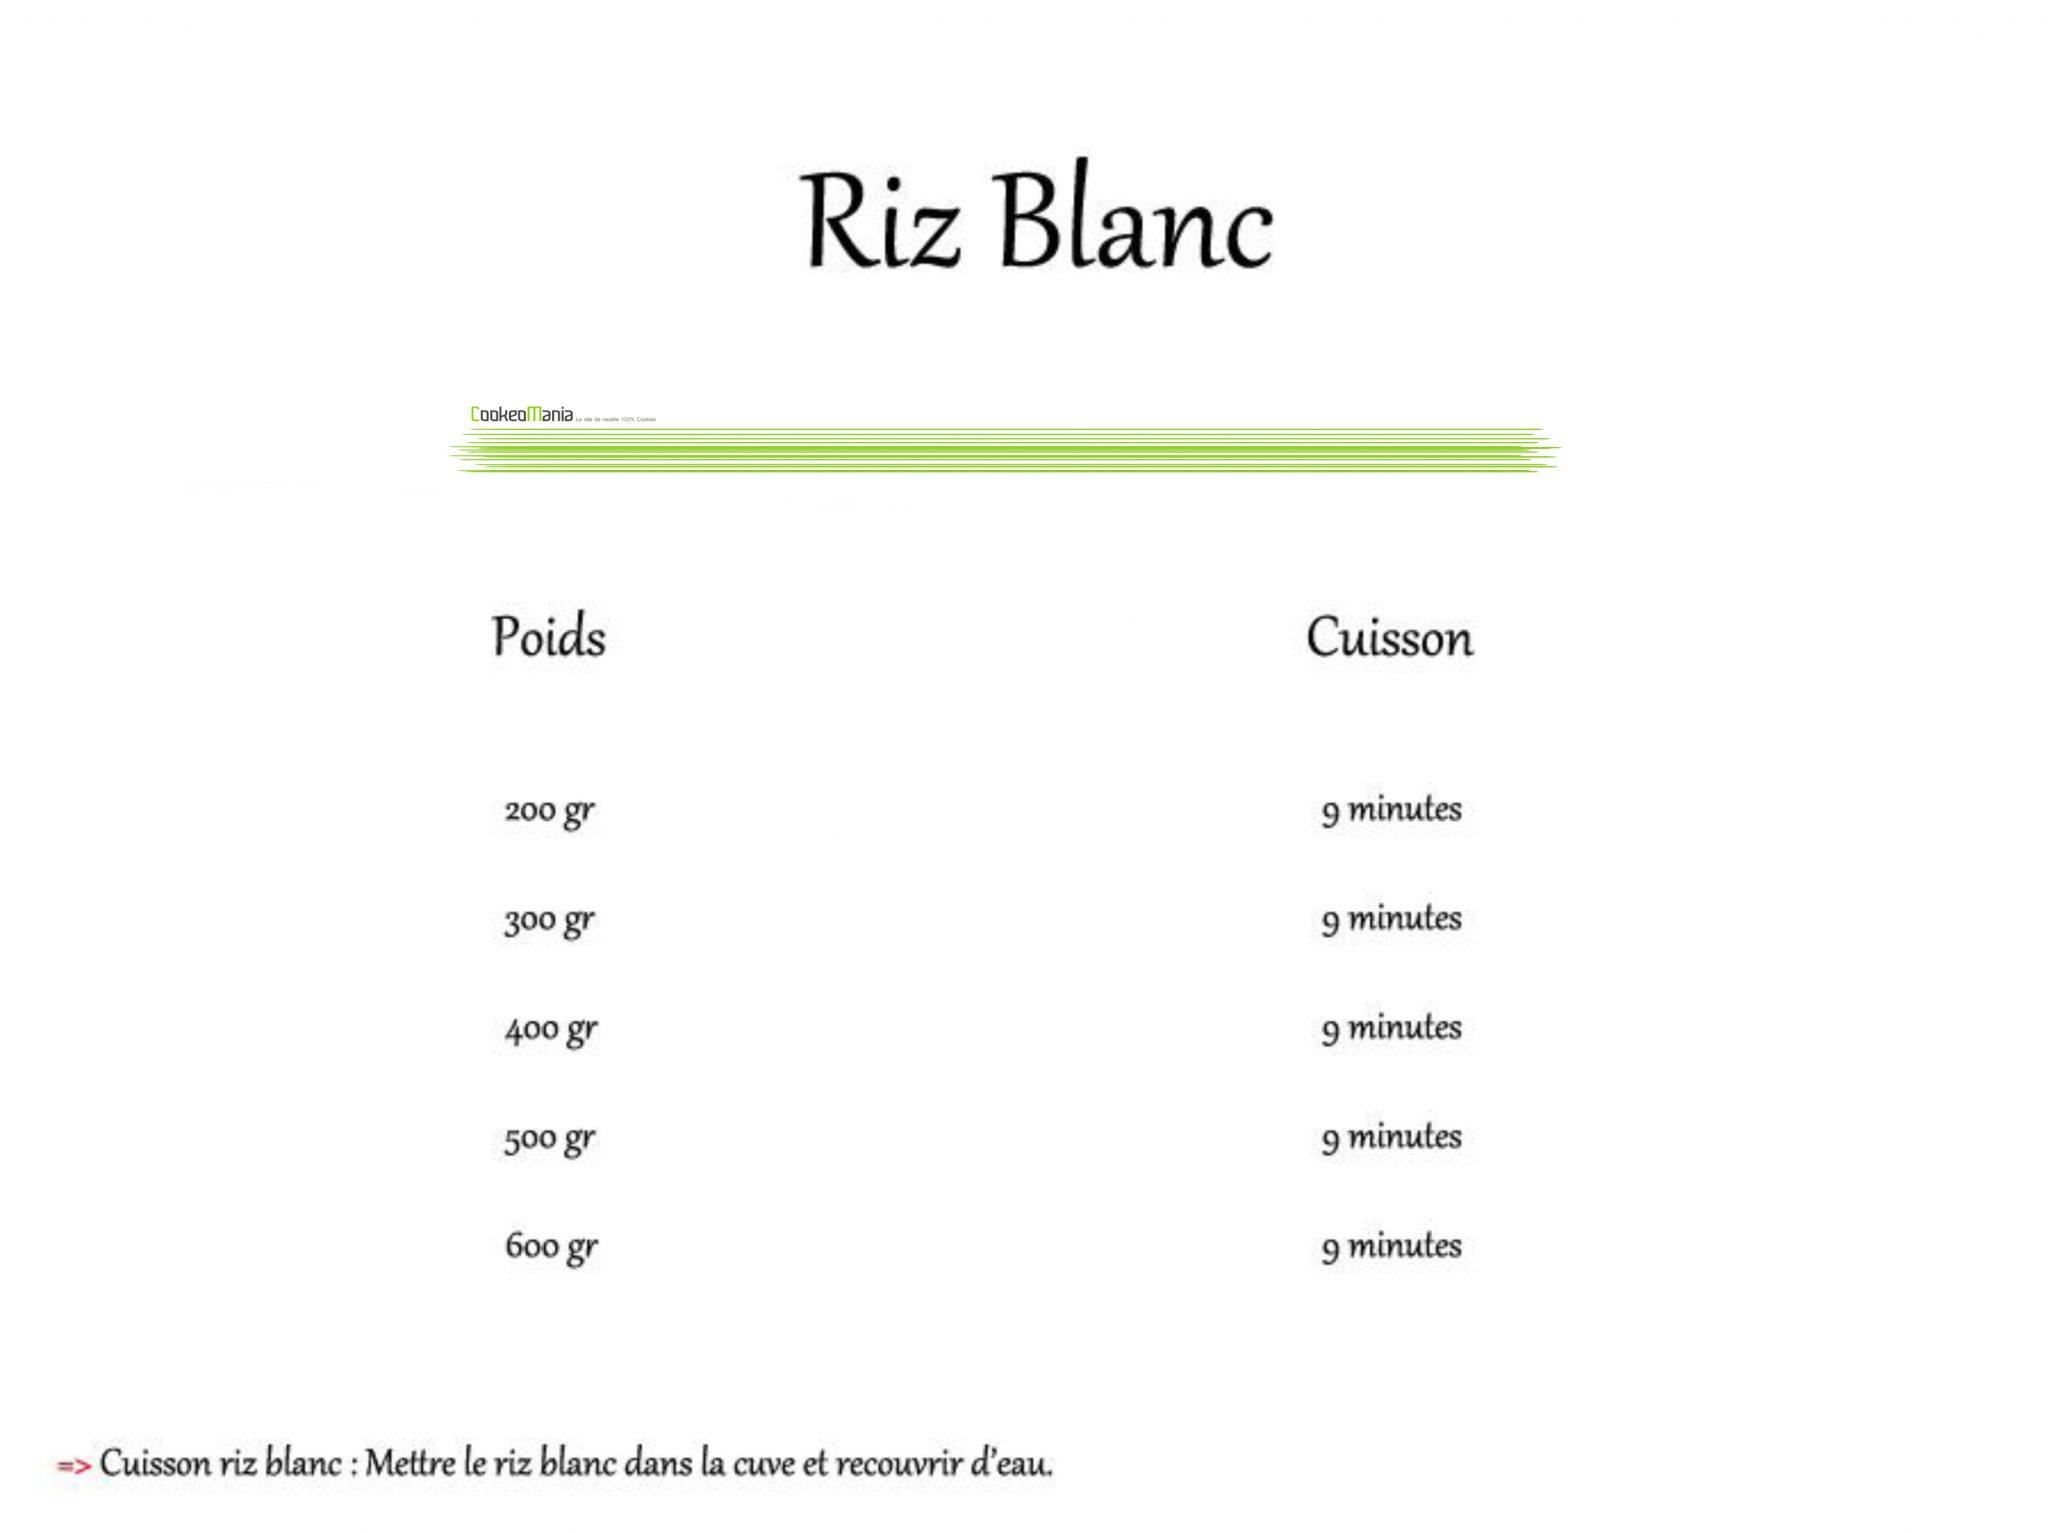 cuisson riz blanc